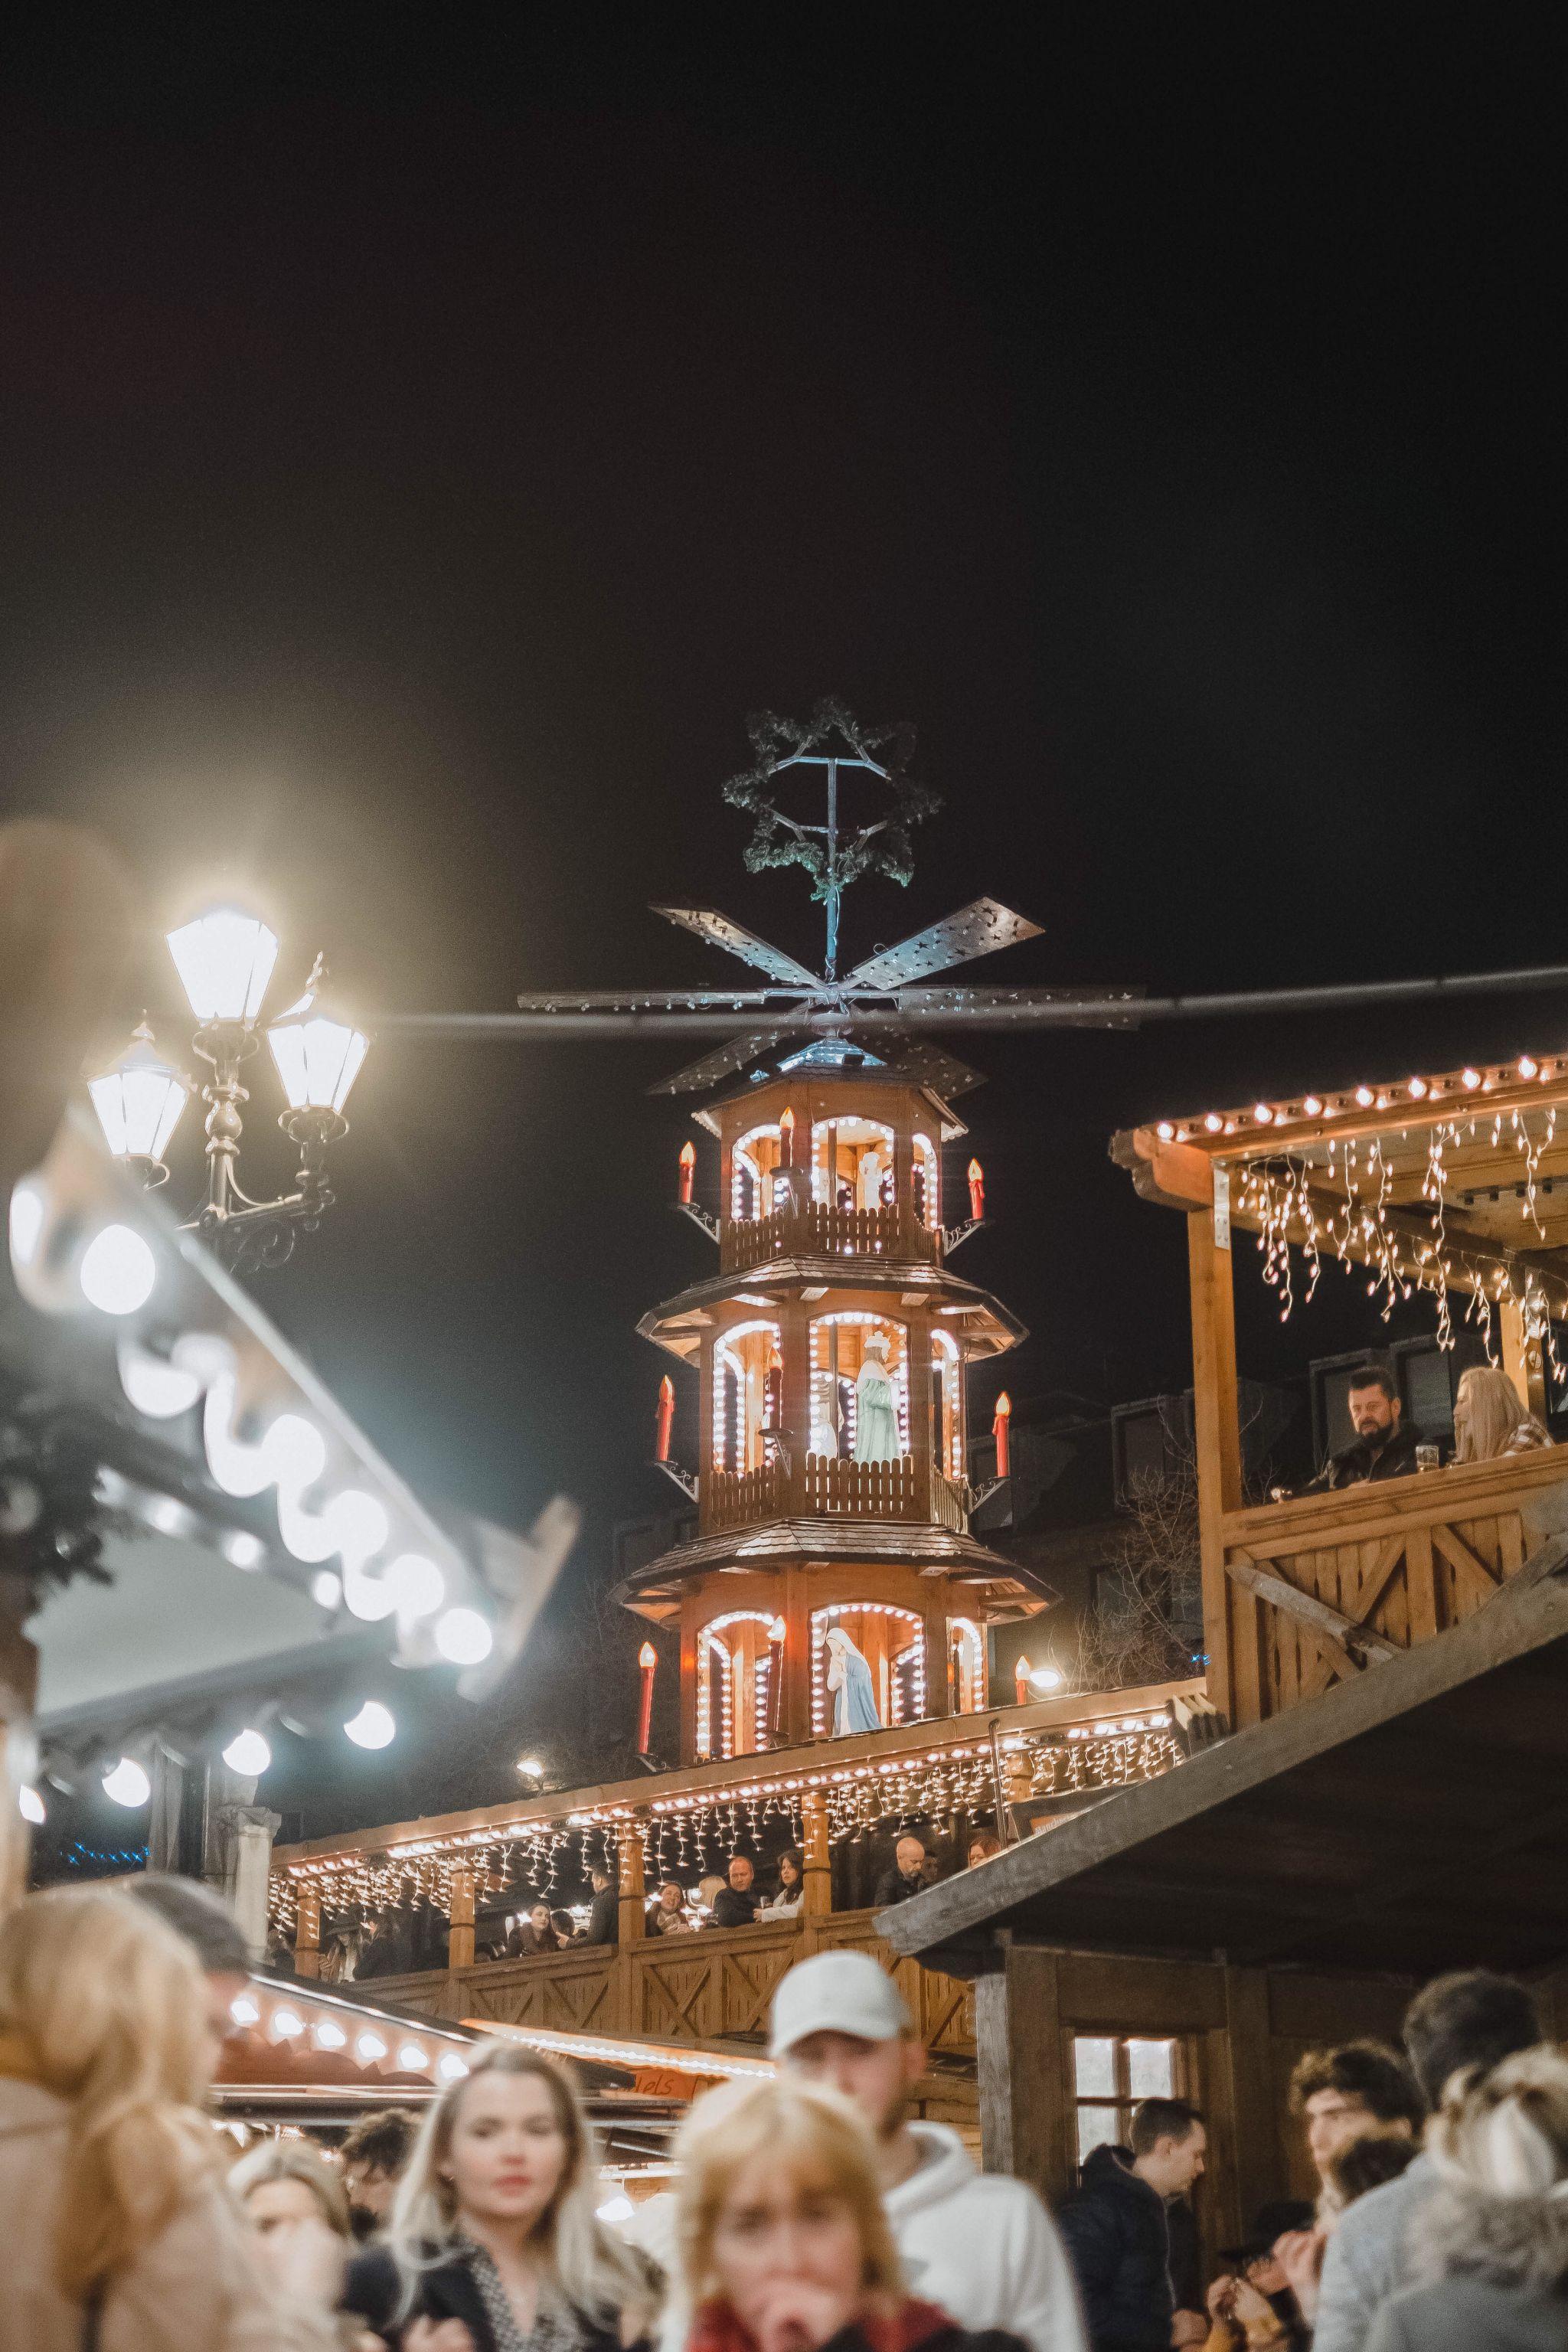 ©Katiewrites.co.uk Manchester, Manchester Christmas Markets 2018, Manc, MCR, Christmas, Xmas, katiebwrites, Katie Writes Blog,